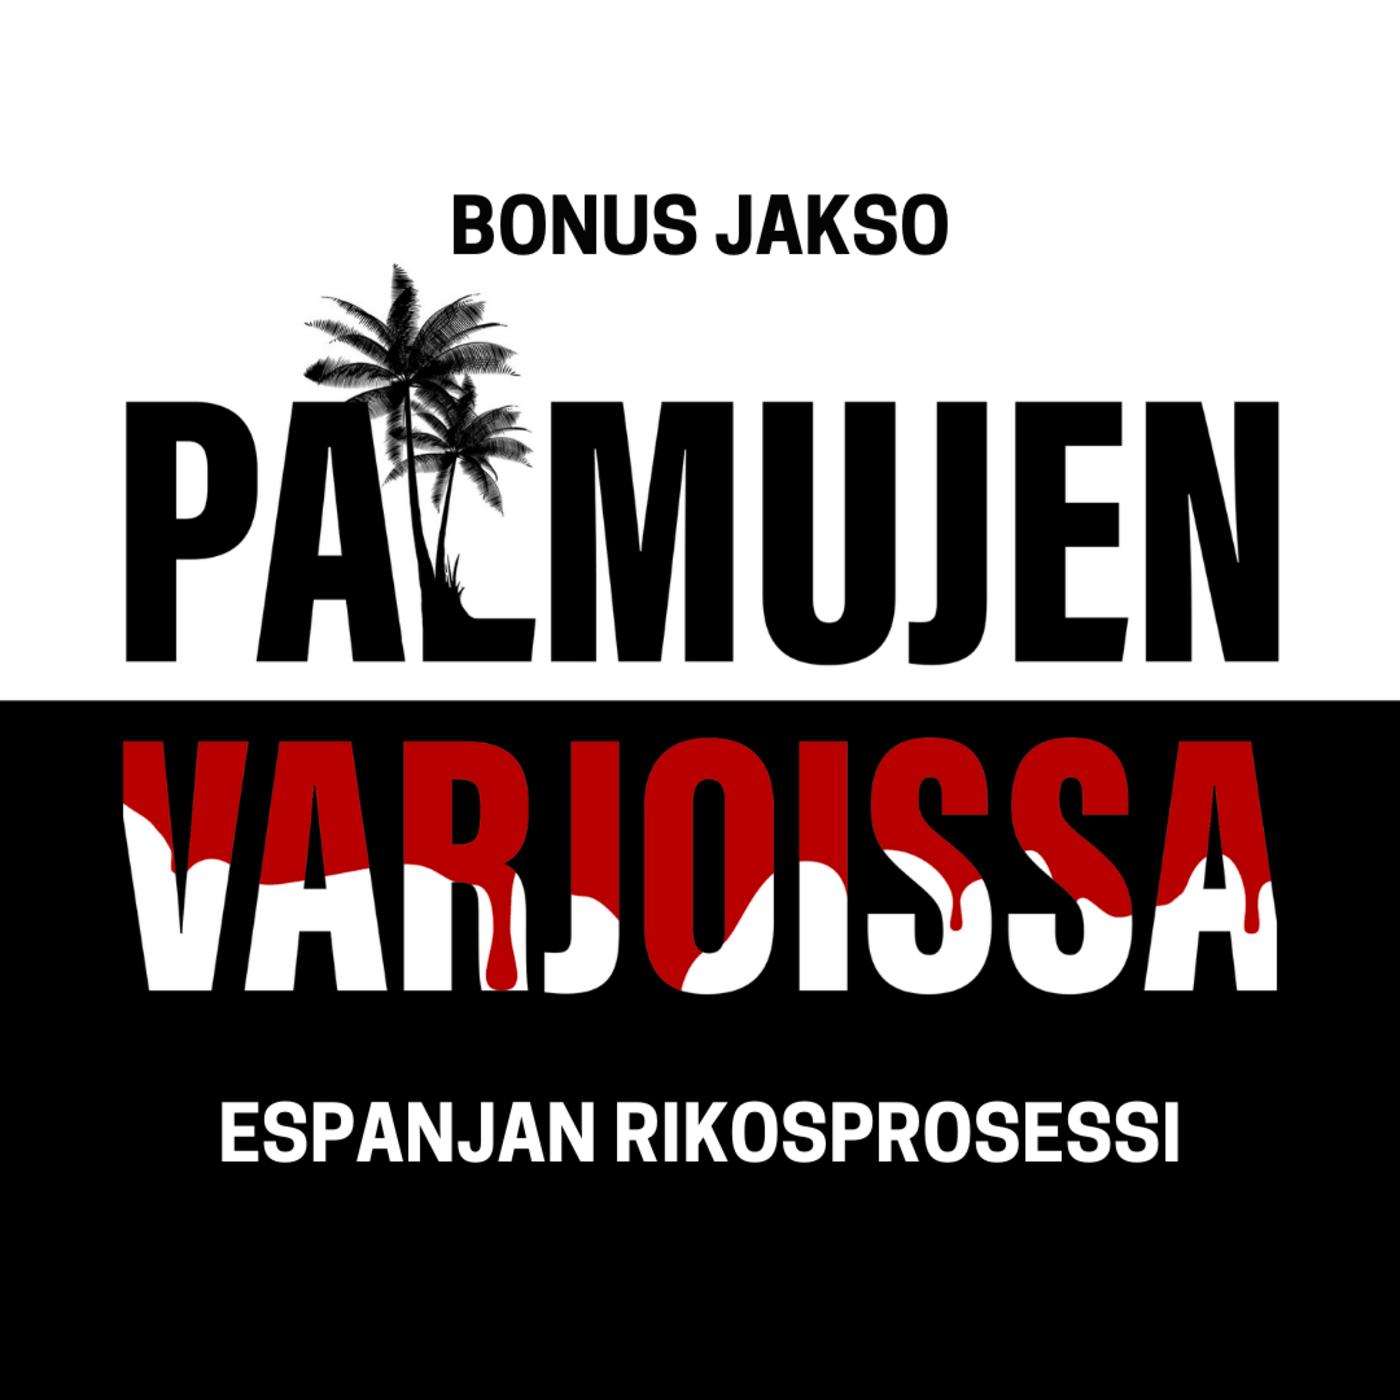 BONUS: Espanjan rikosprosessi